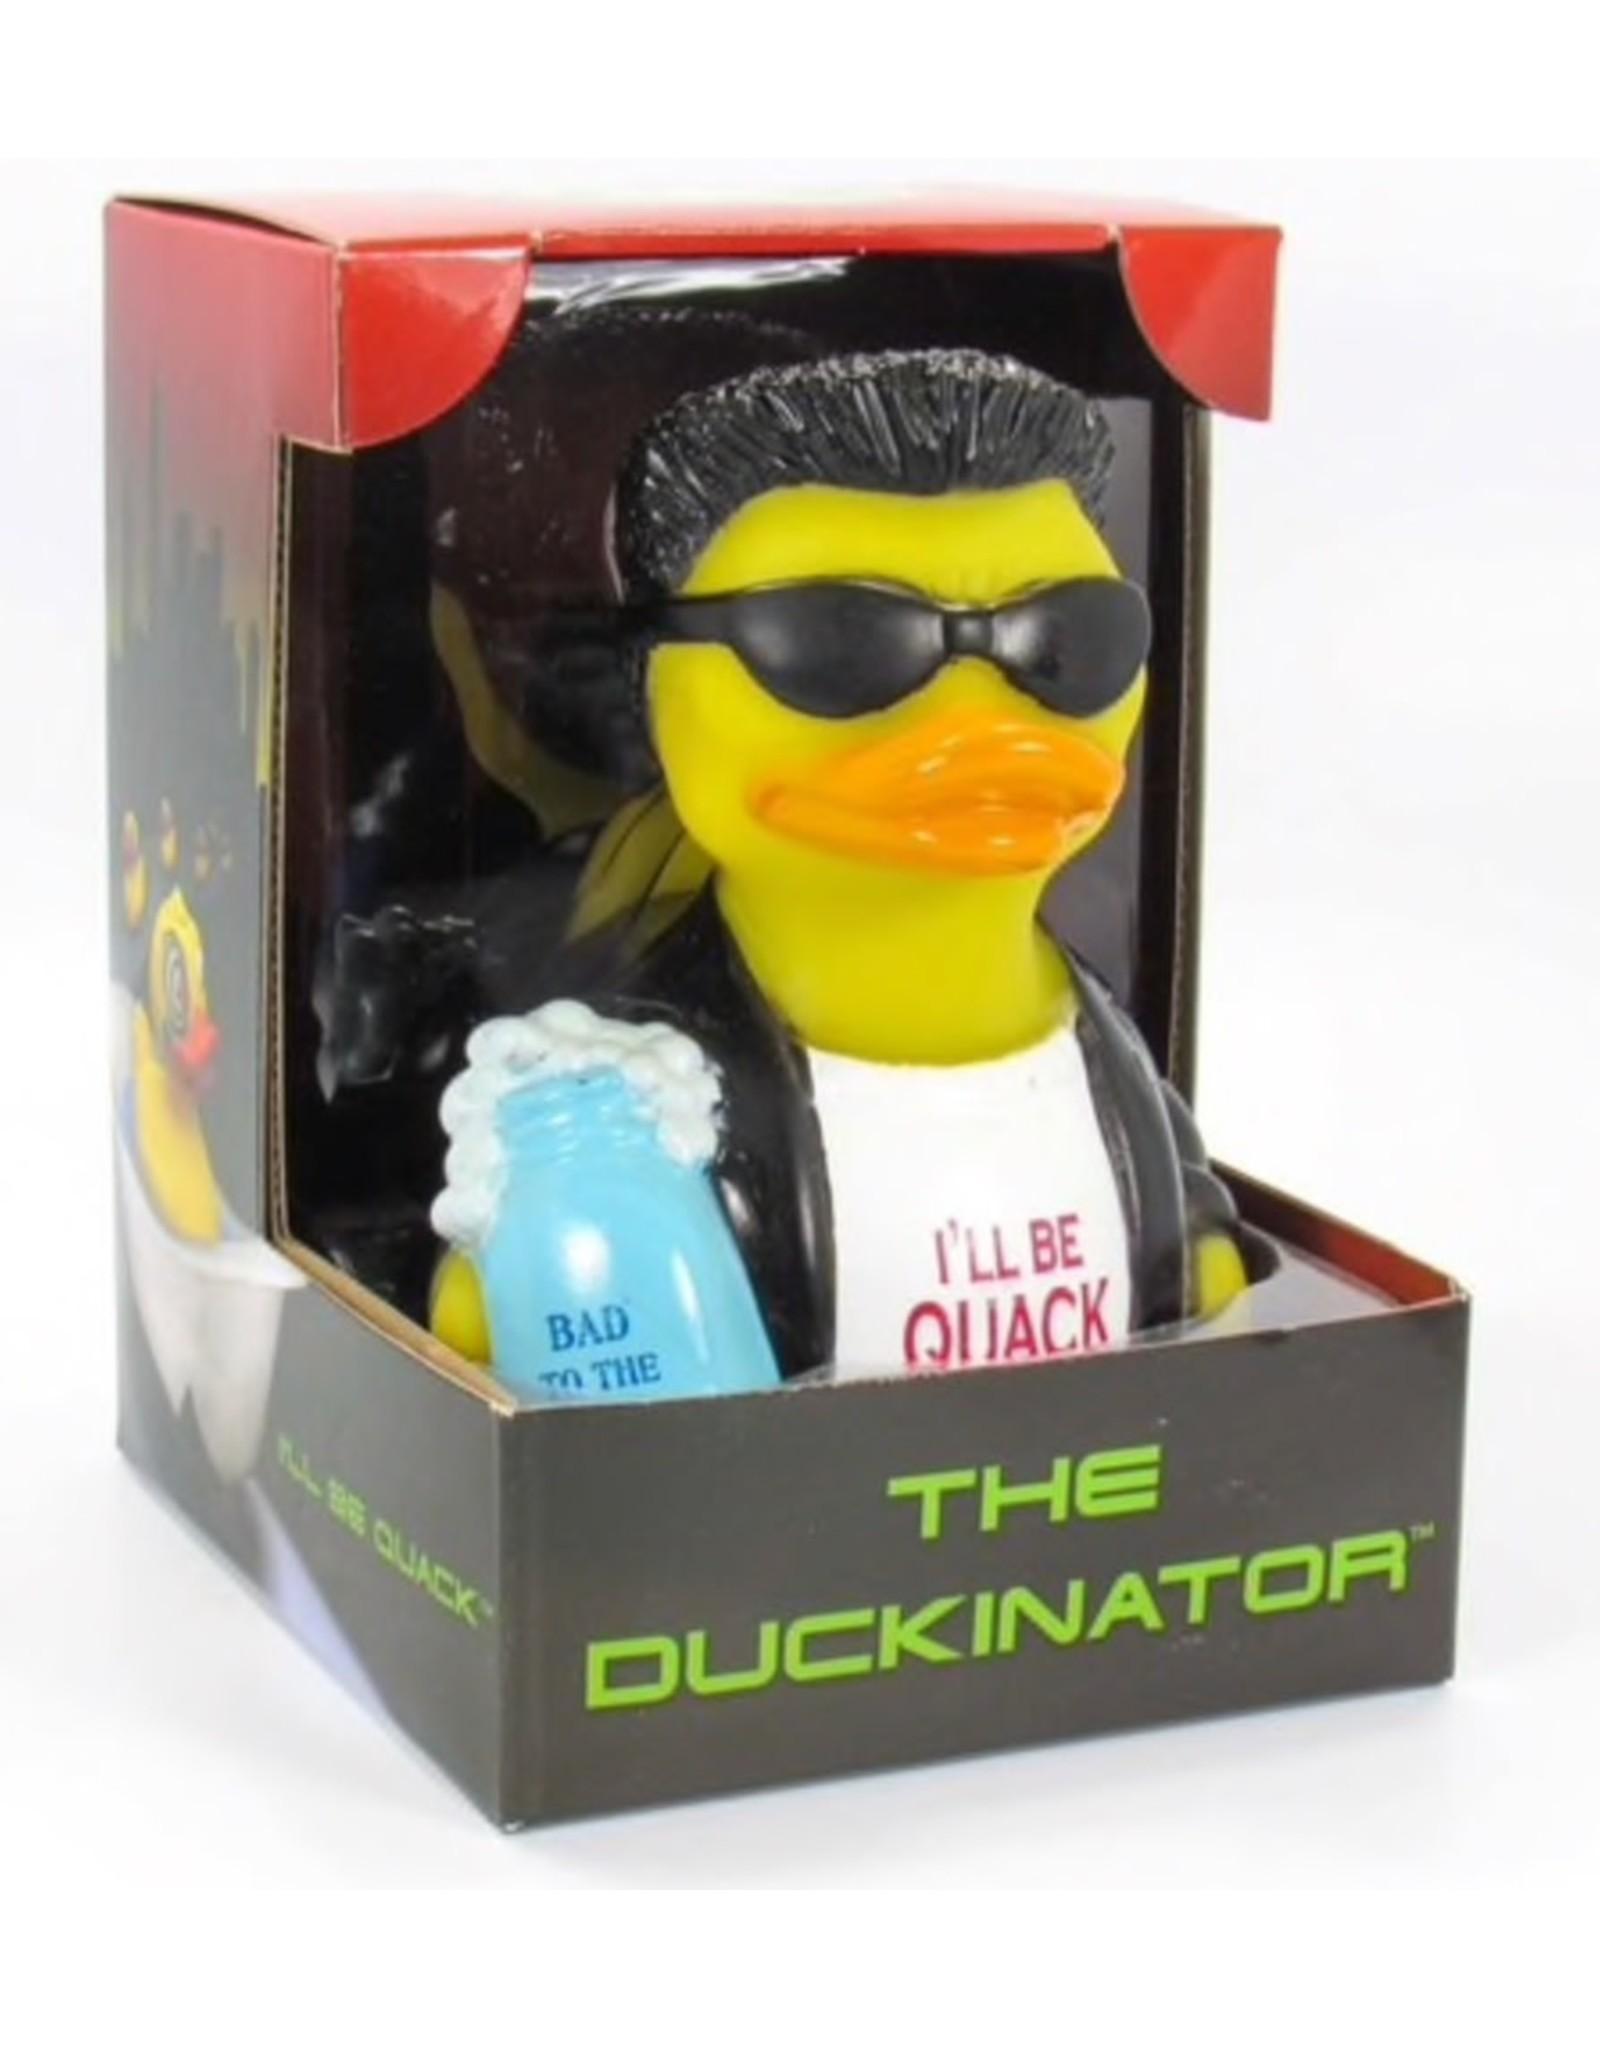 Le Duckinator